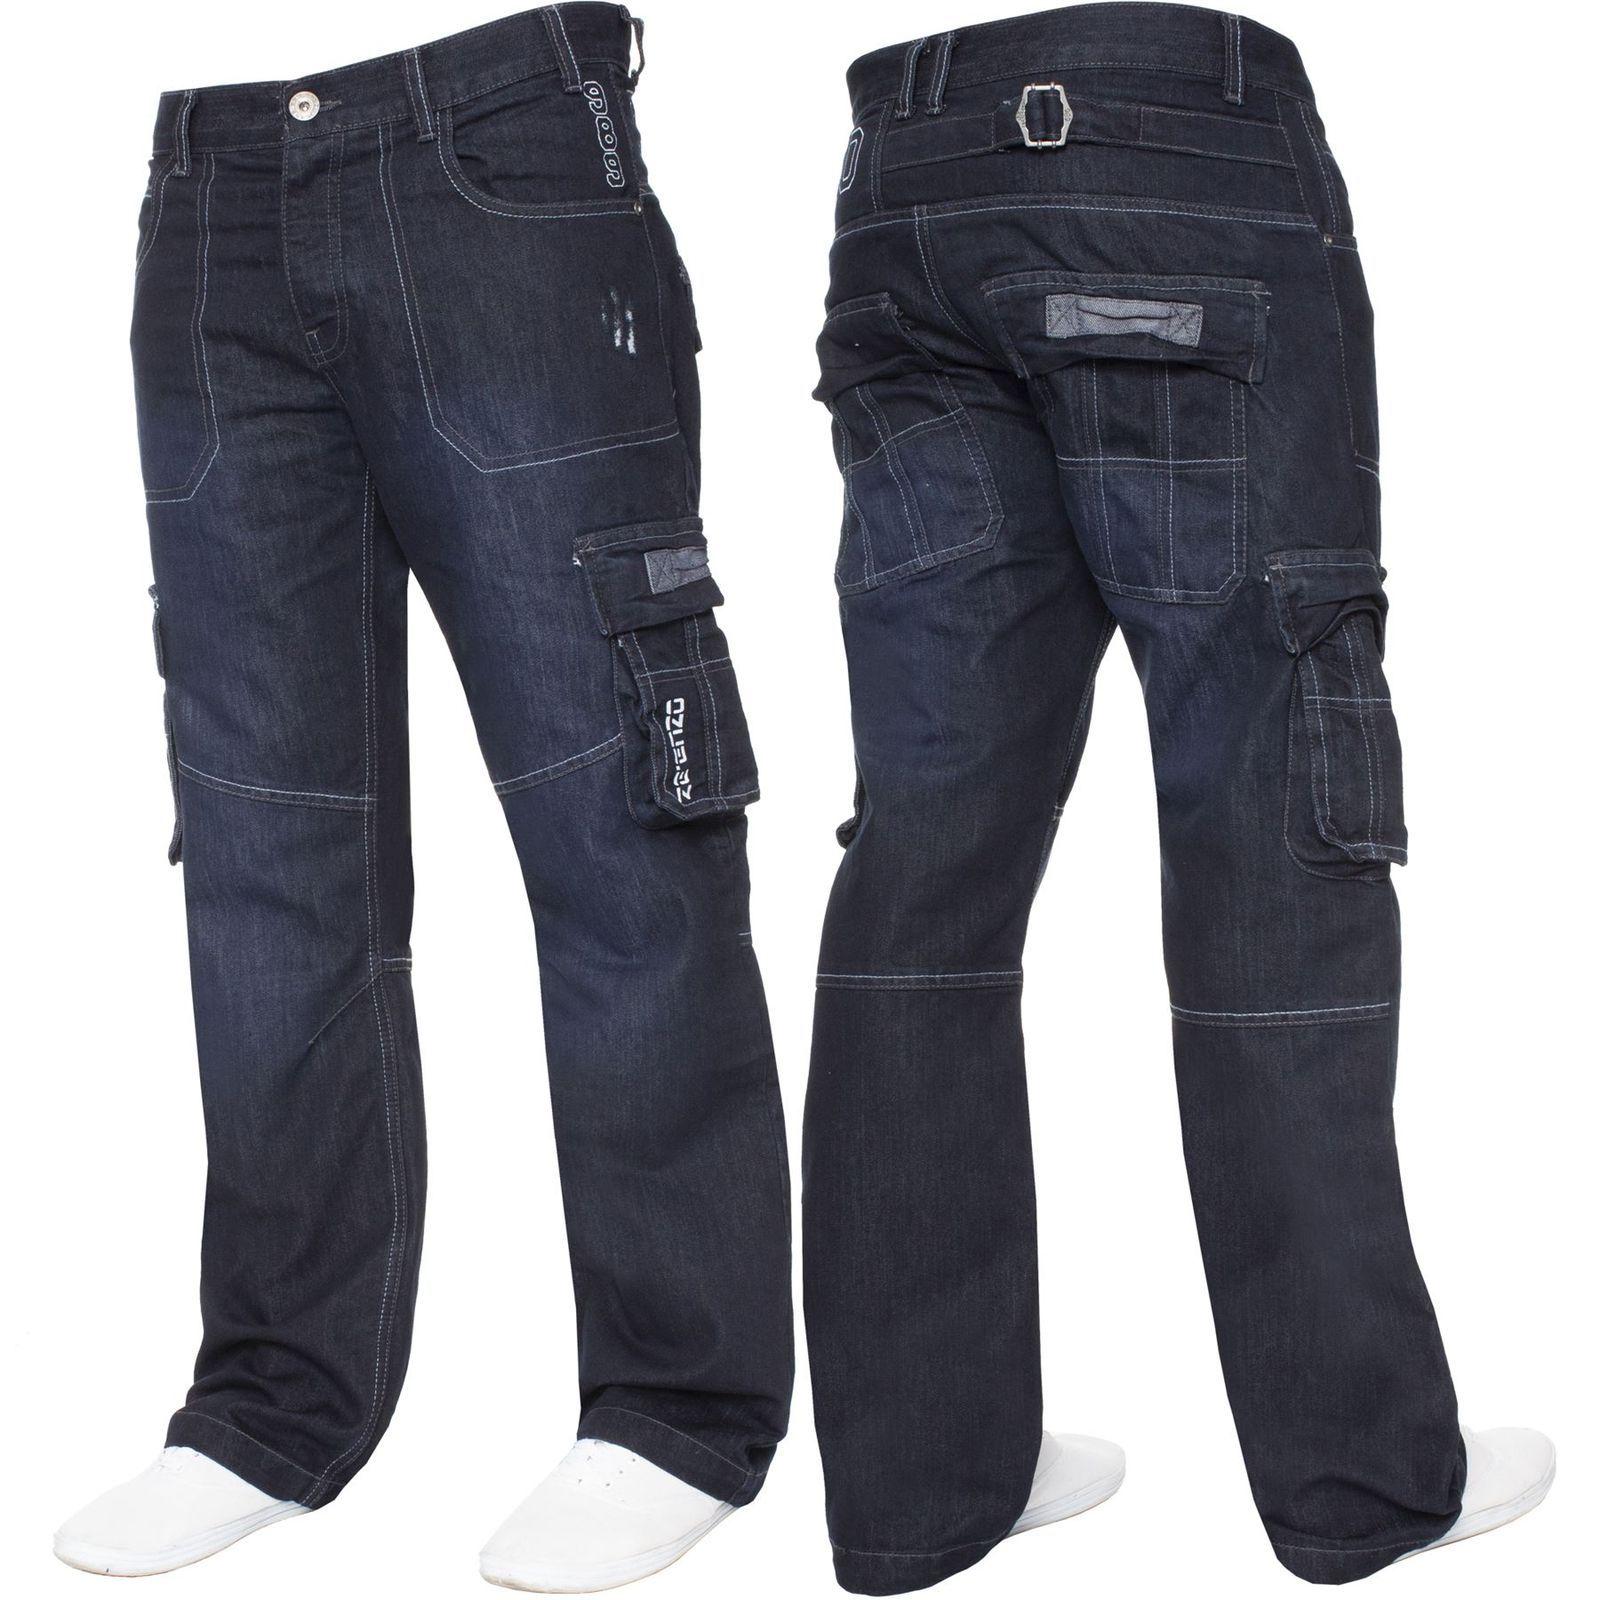 New Mens ENZO Regular Straight Fit Denim Blue Jeans Pants All Waist Sizes